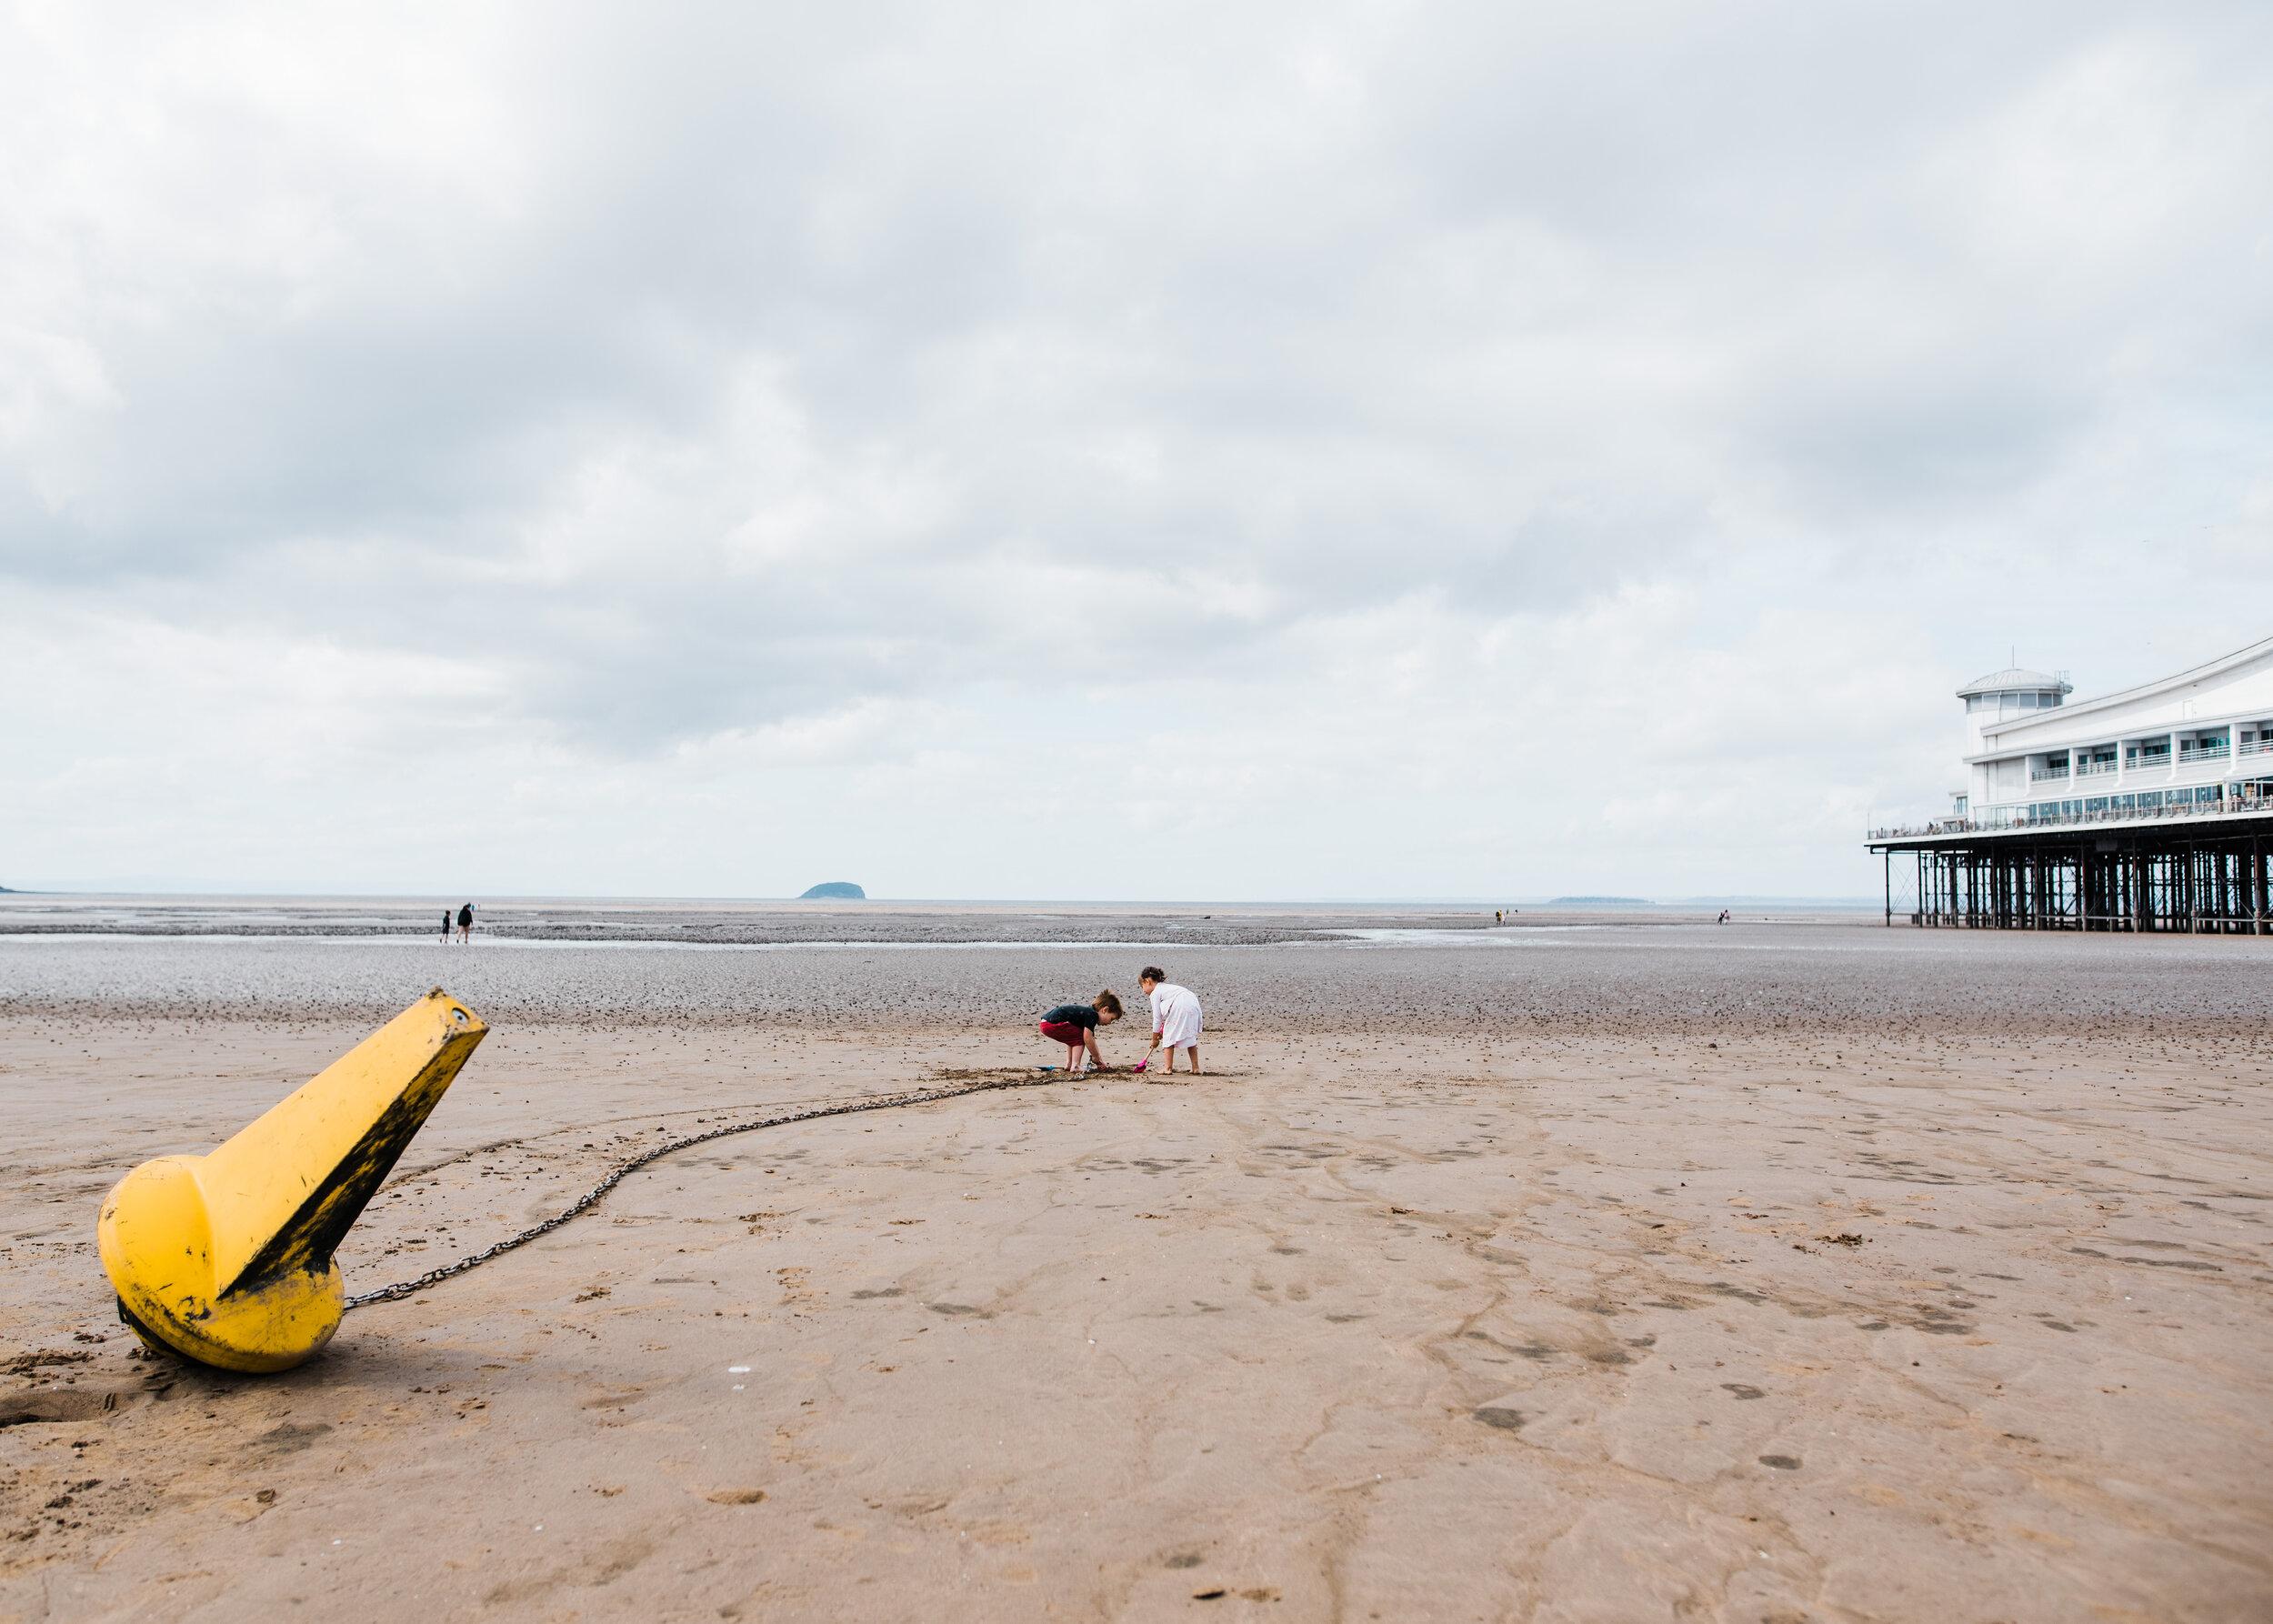 Beach-Digging-8371.jpg